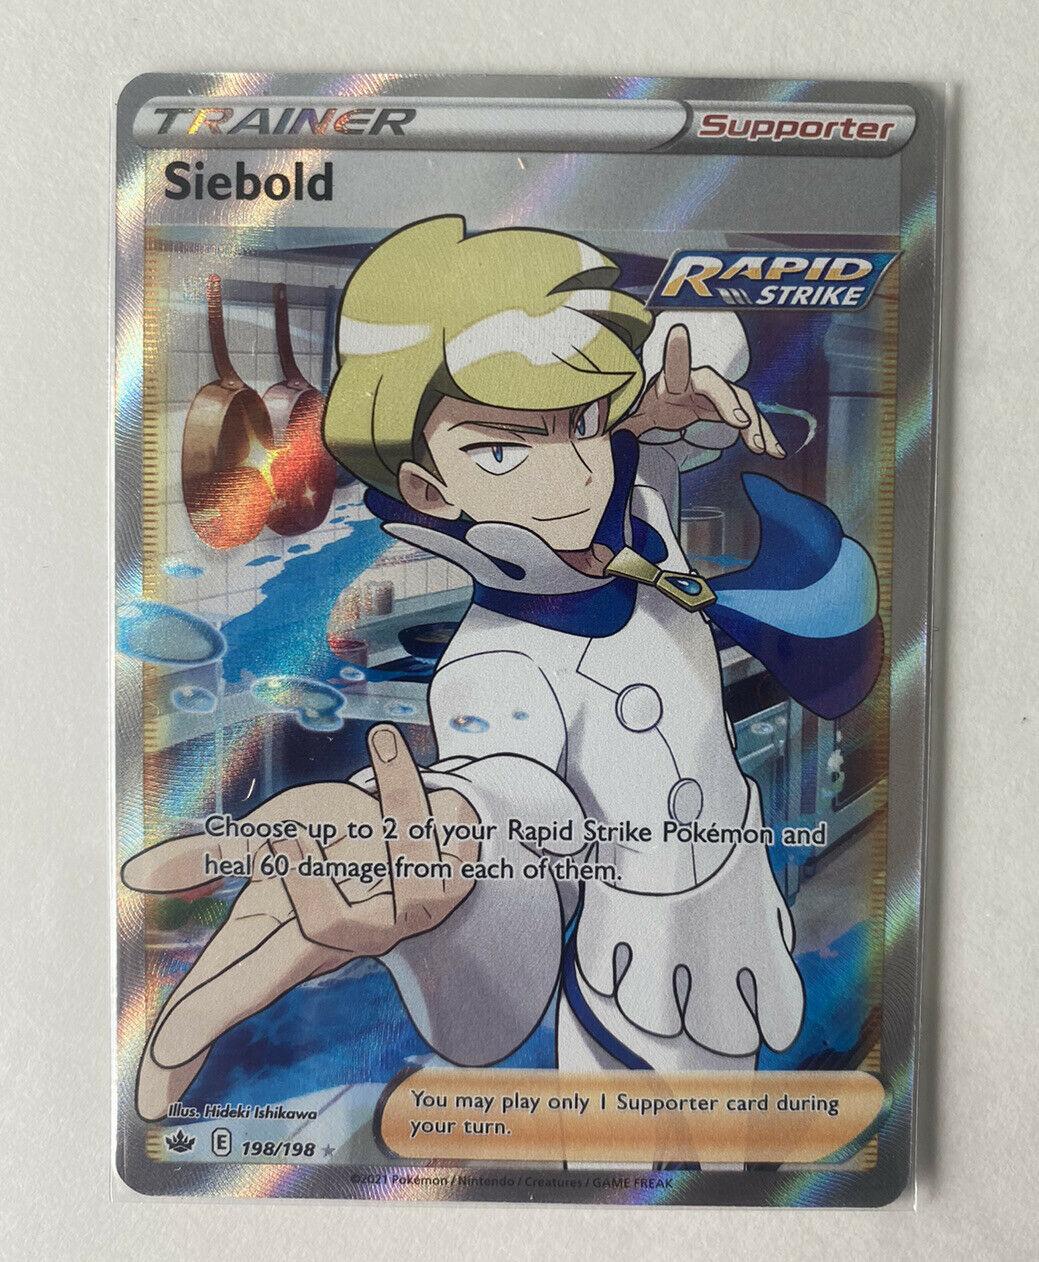 Siebold Full Art Trainer Chilling Reign Pokemon NM Condition 198/198 Fresh Pull